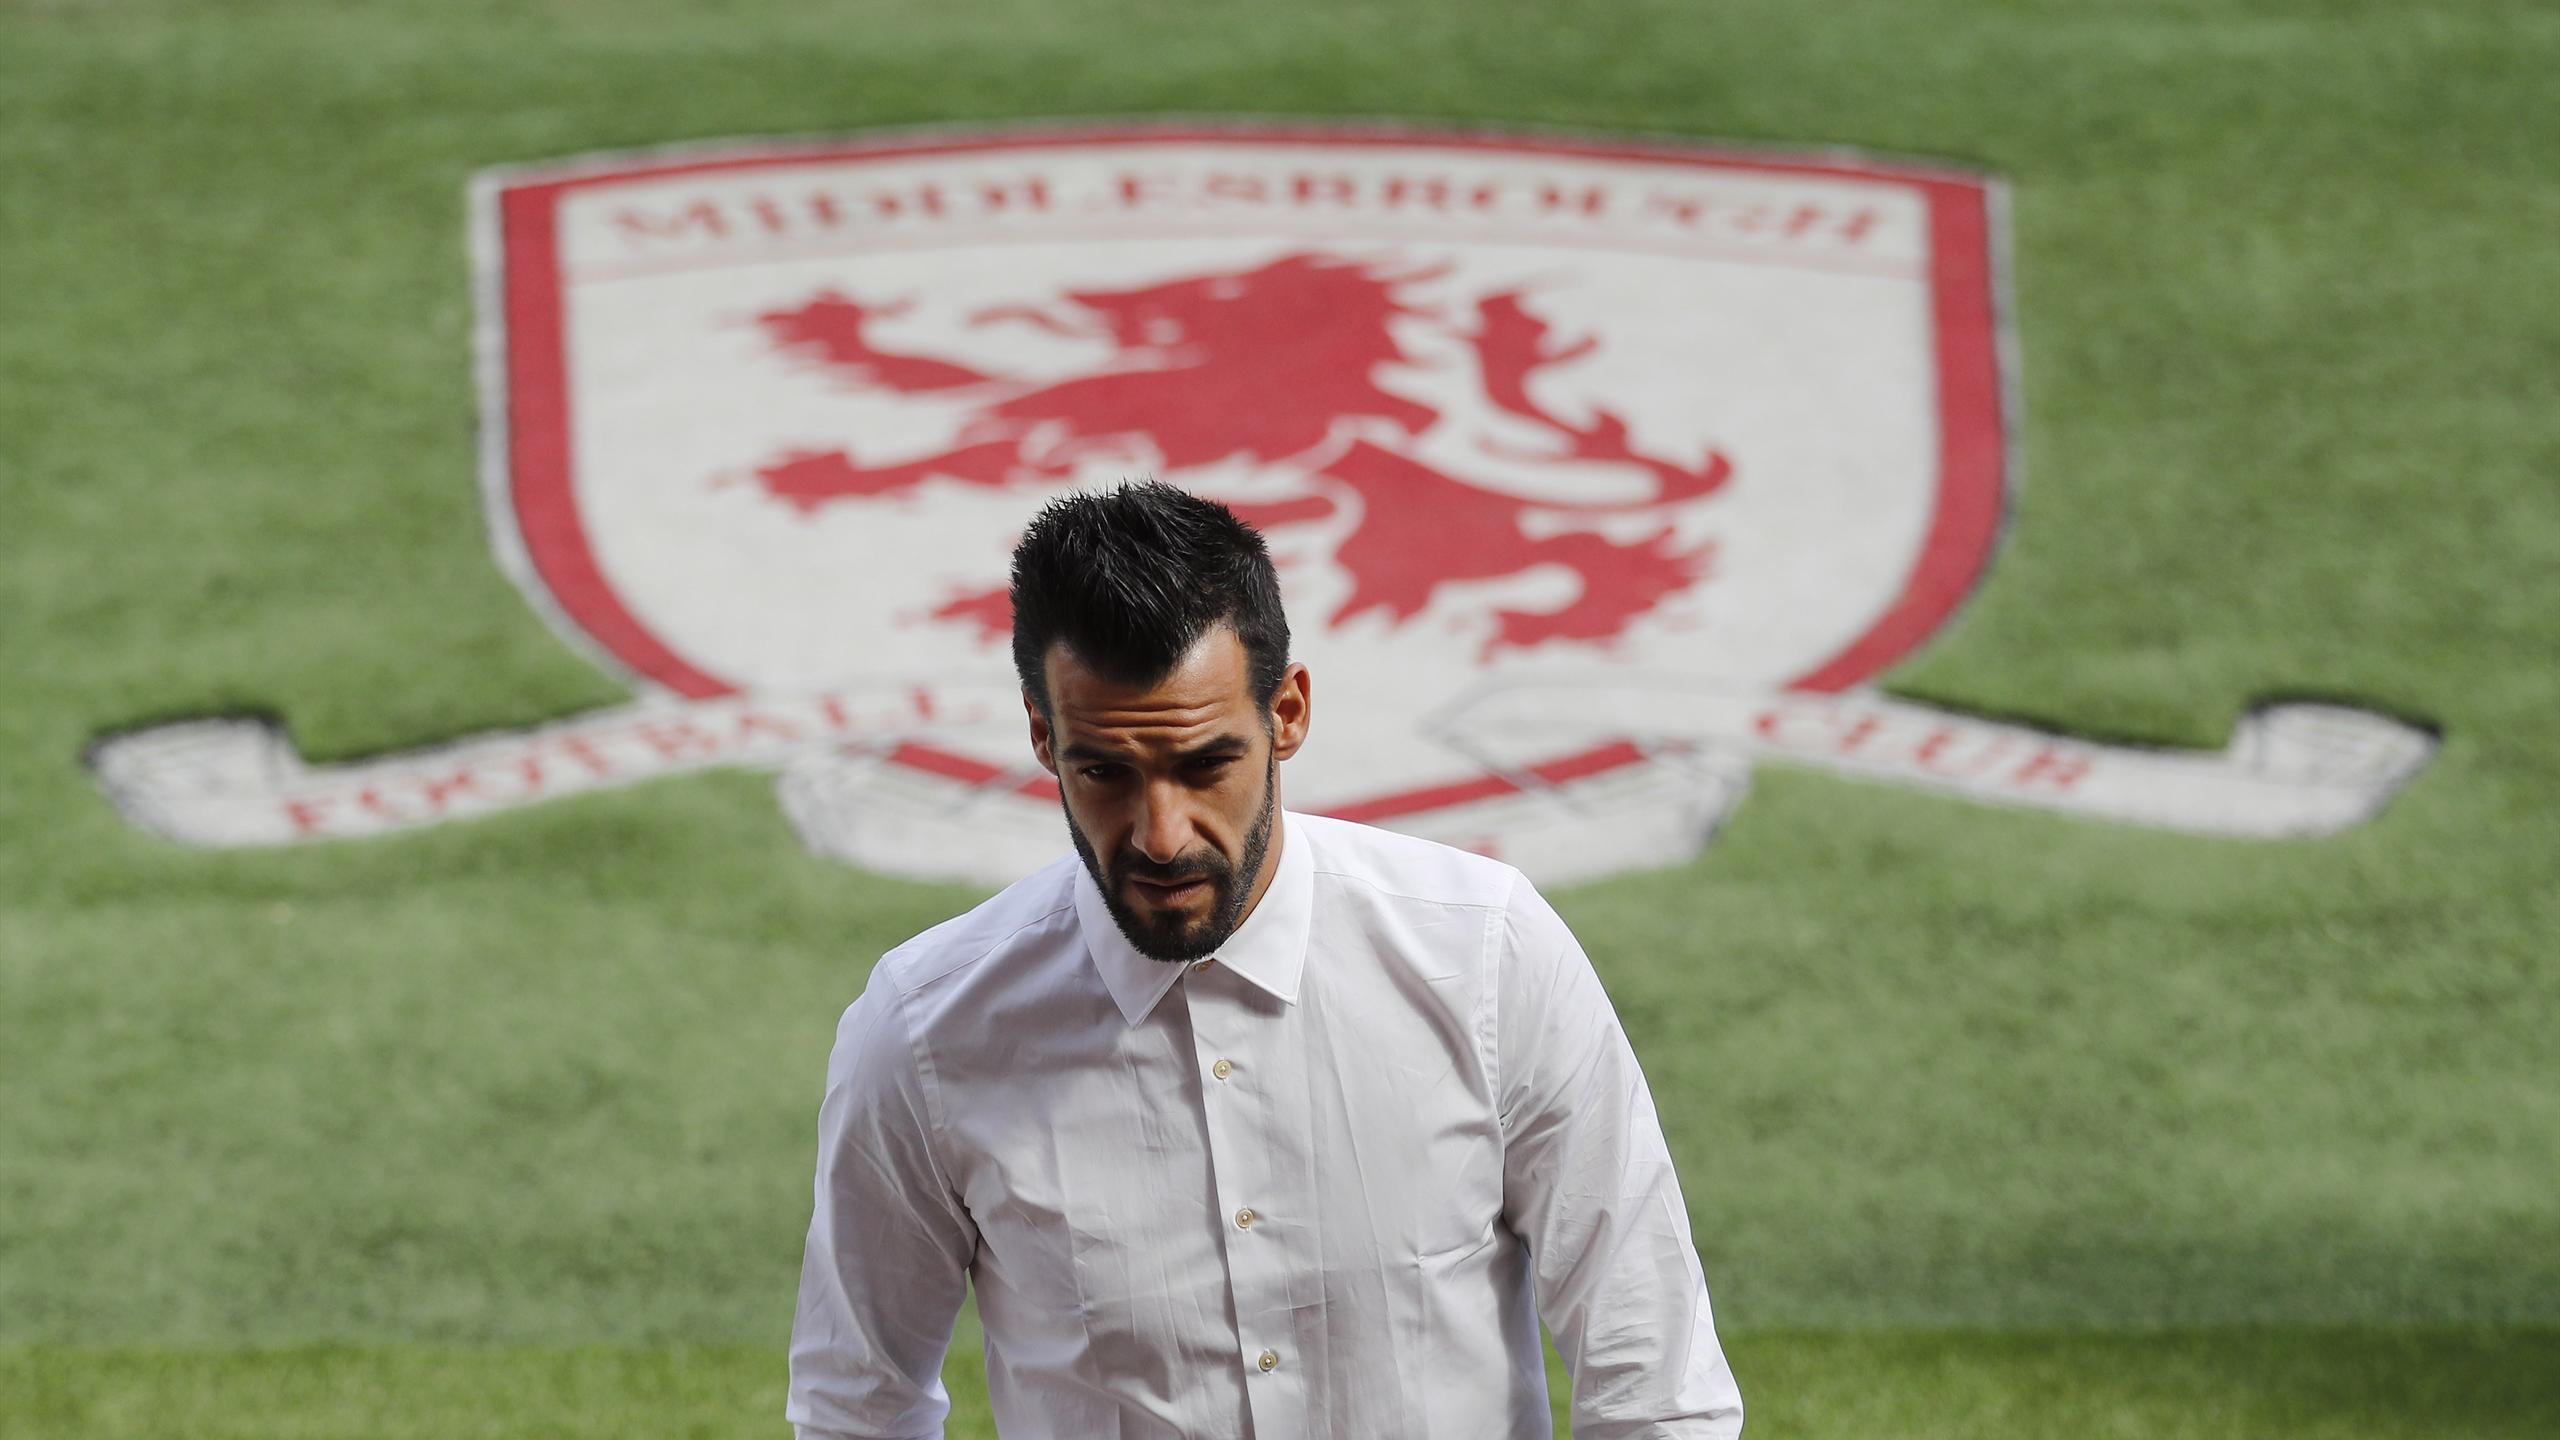 Middlesbrough's Alvaro Negredo before the game